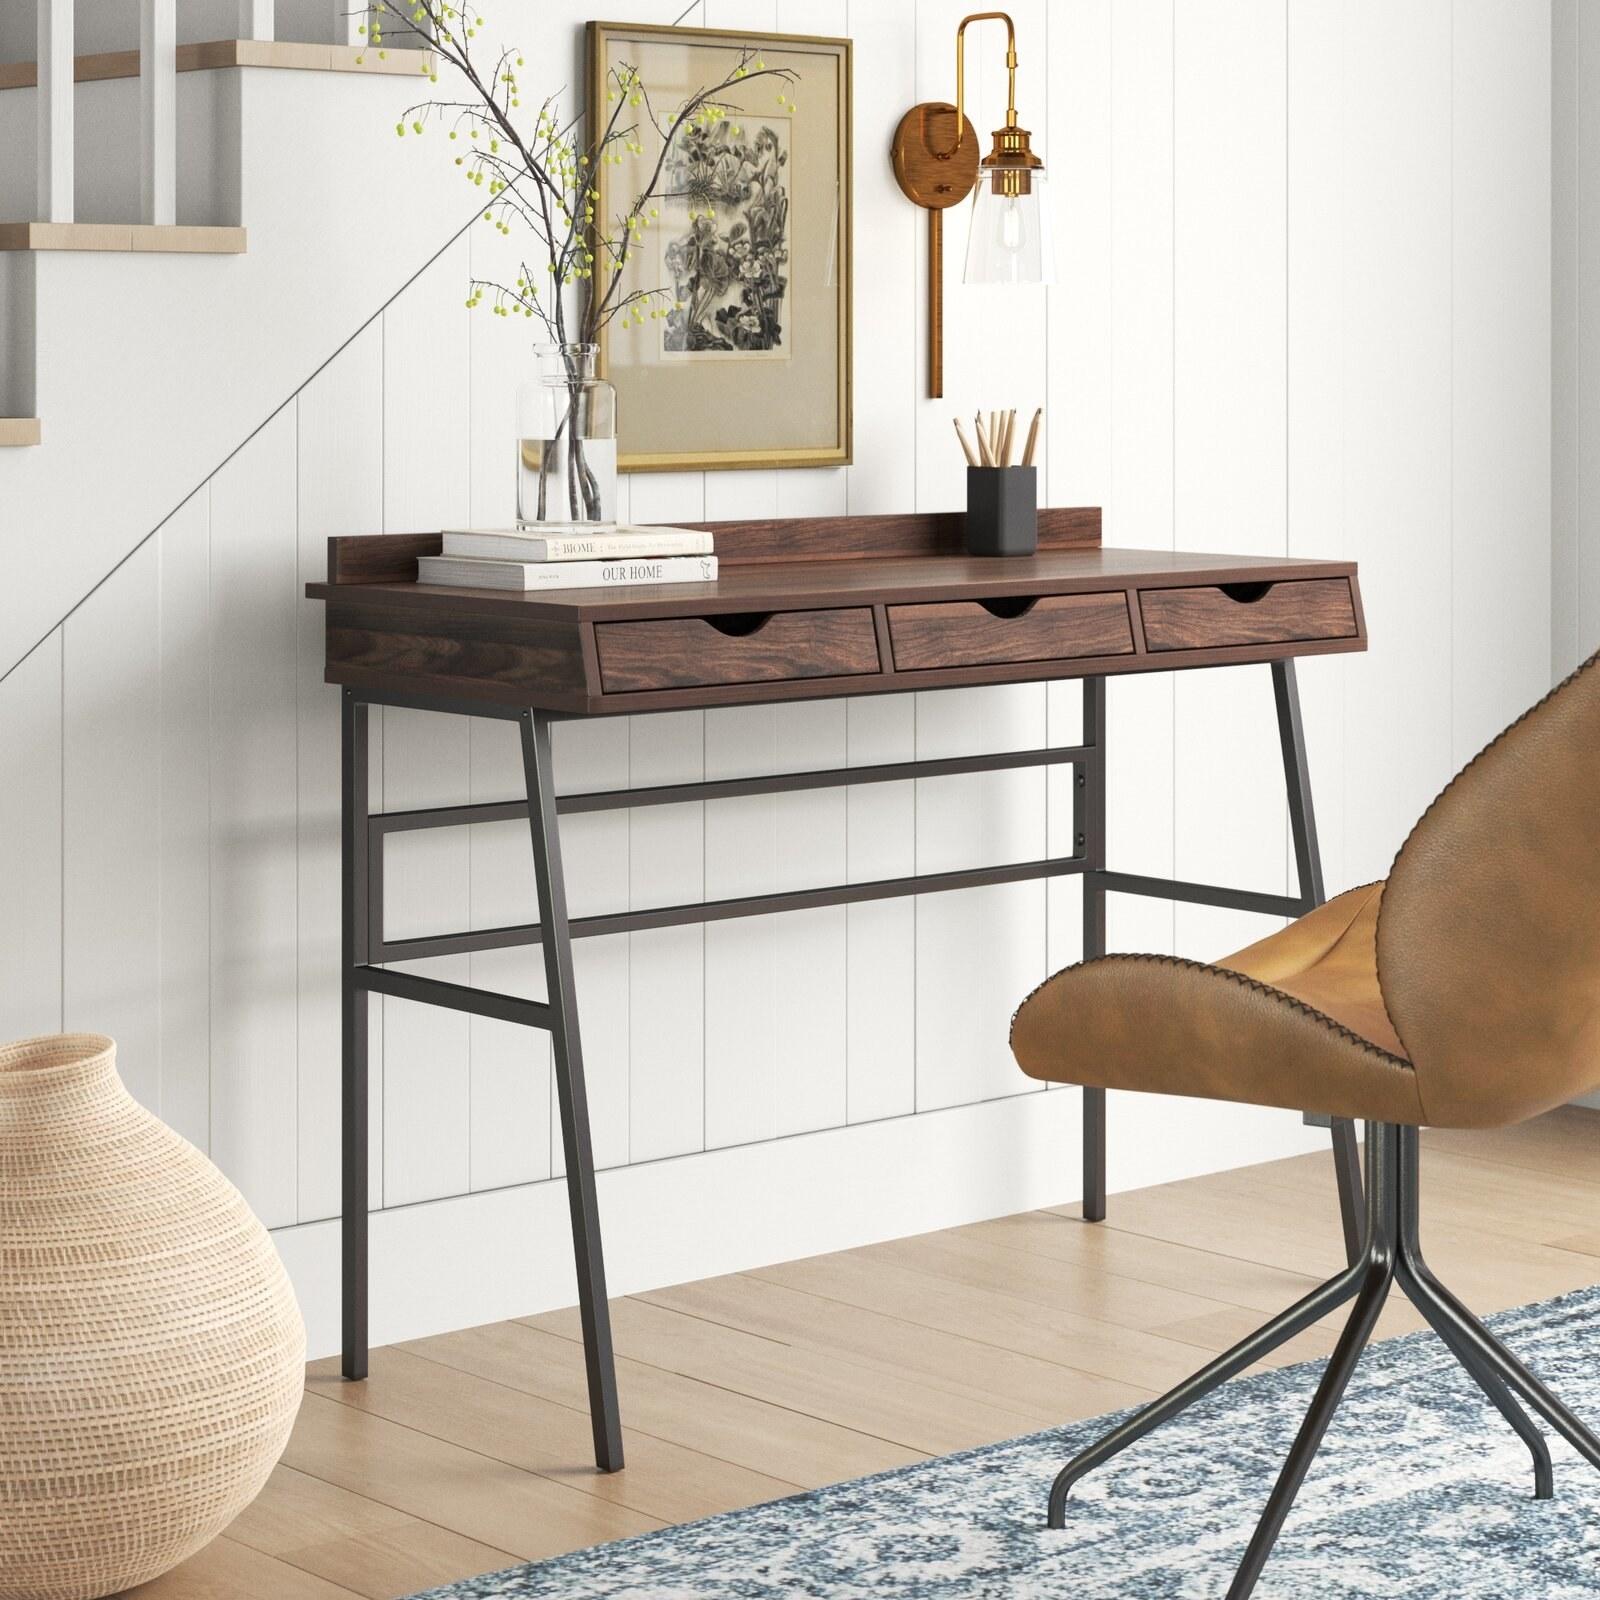 The desk in Dark Walnut